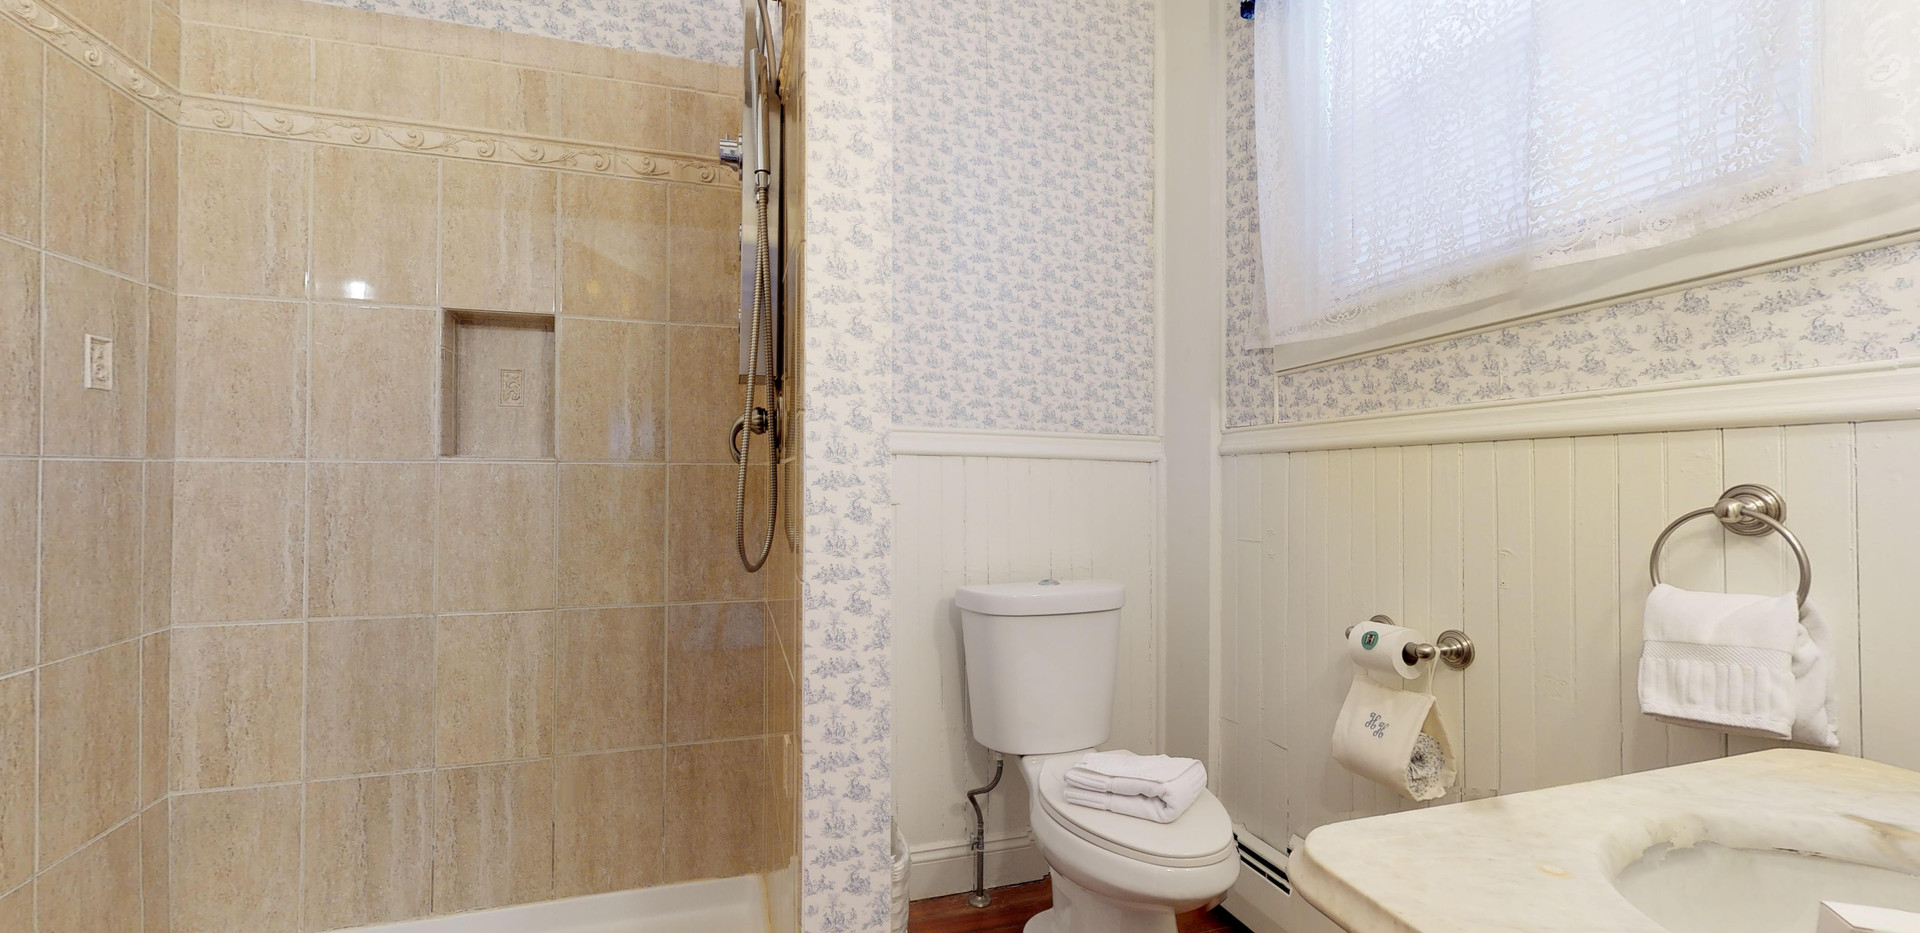 Blue Ribbon Bathroom with shower.jpg